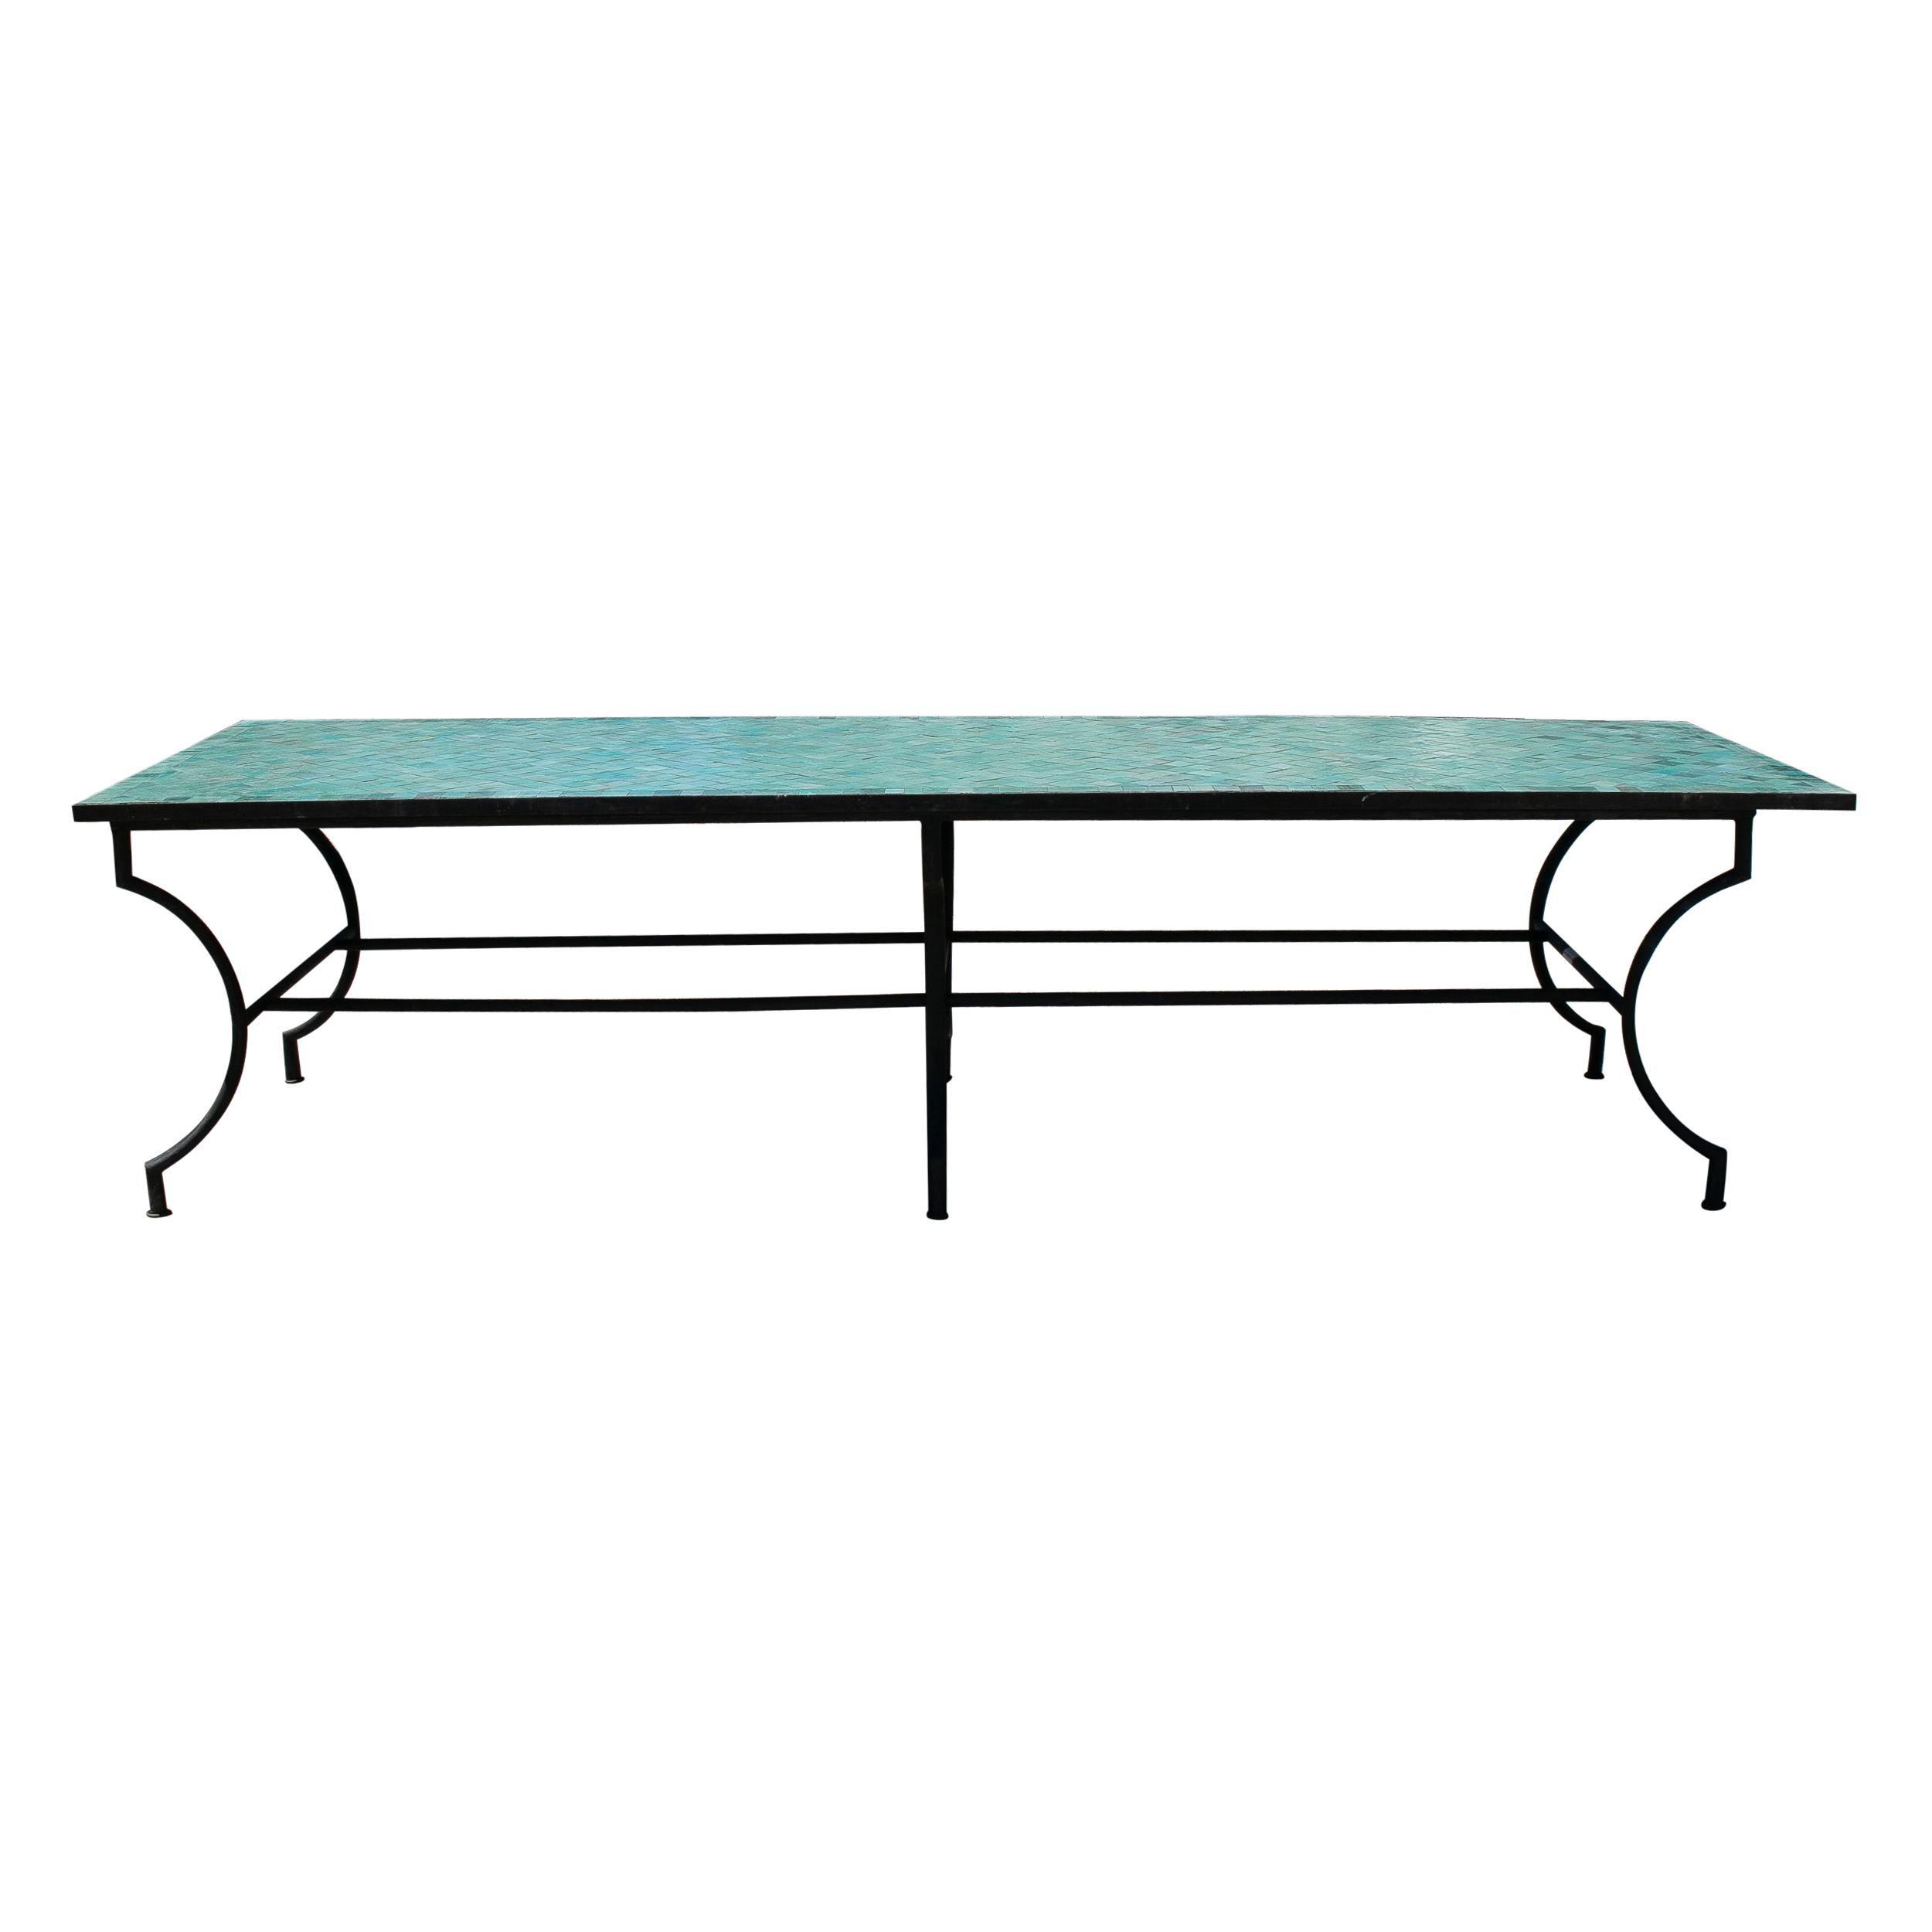 Rectangular Spanish Green Glazed Zellige Tiled Mosaic Iron Outdoor Table